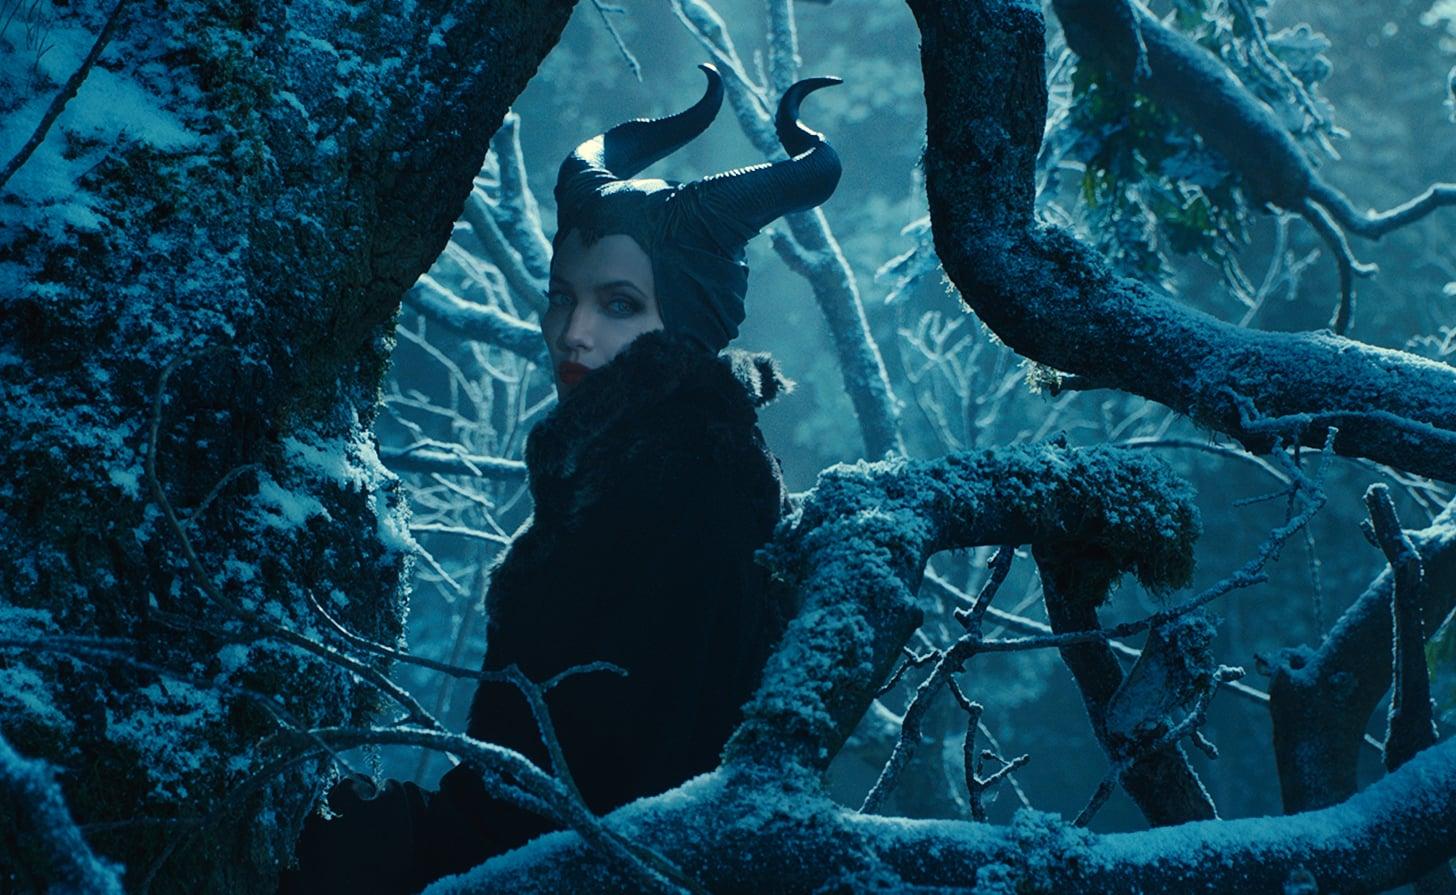 Maleficent, 2014